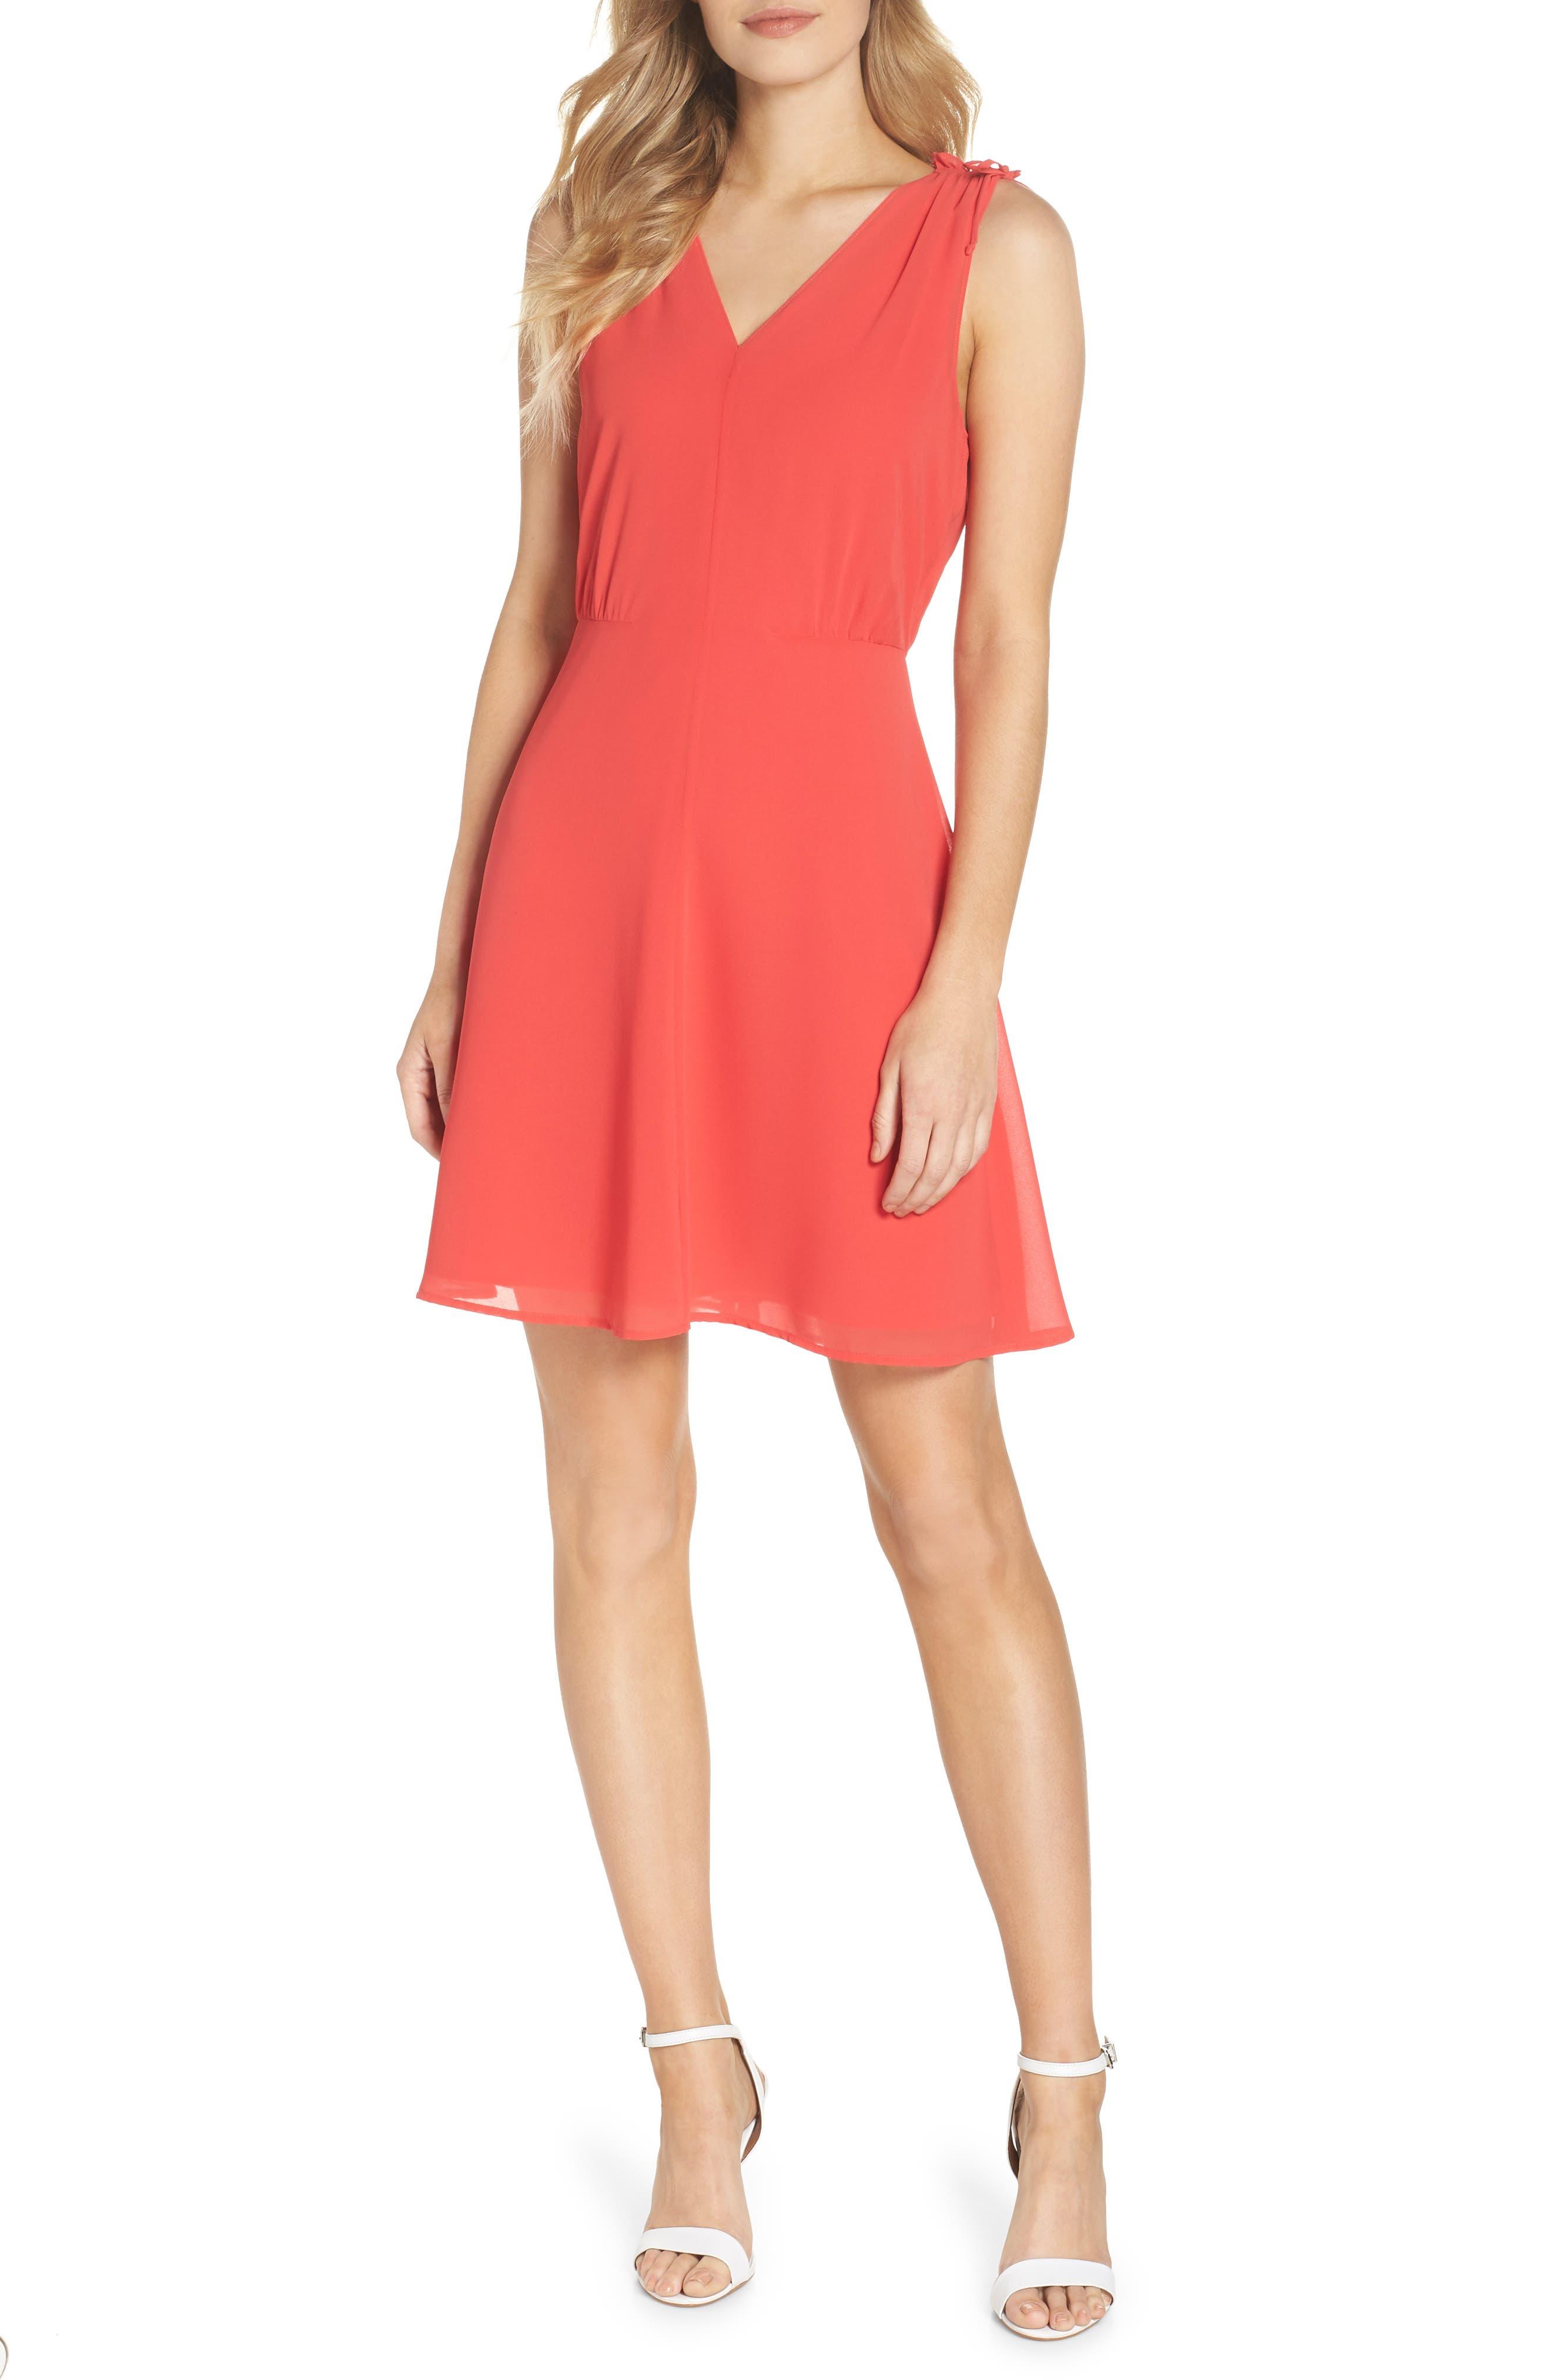 Soufflé V-Neck Chiffon Dress,                         Main,                         color, STRAWBERRY